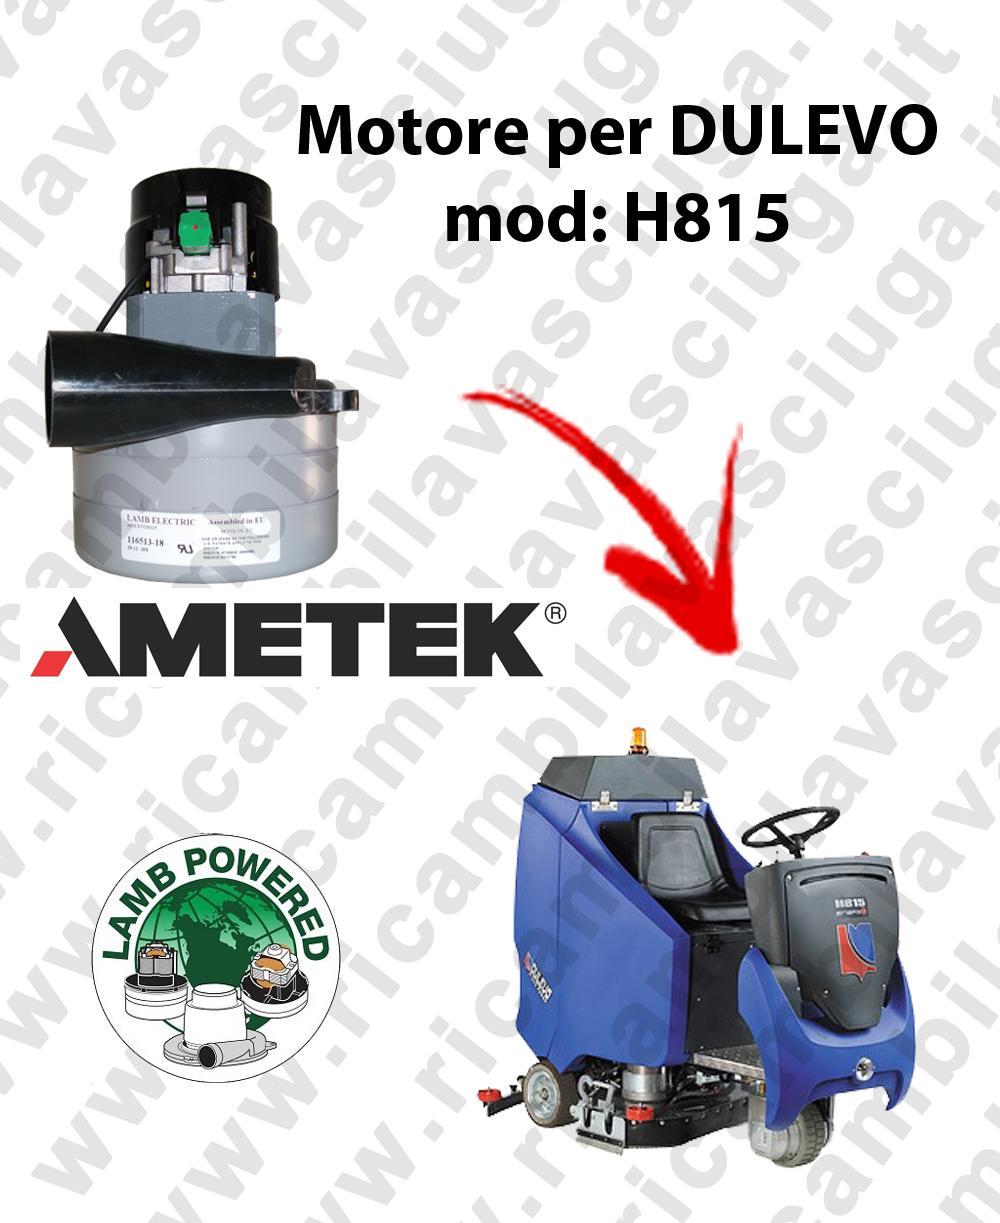 H815 Motore de aspiración LAMB AMETEK para fregadora DULEVO